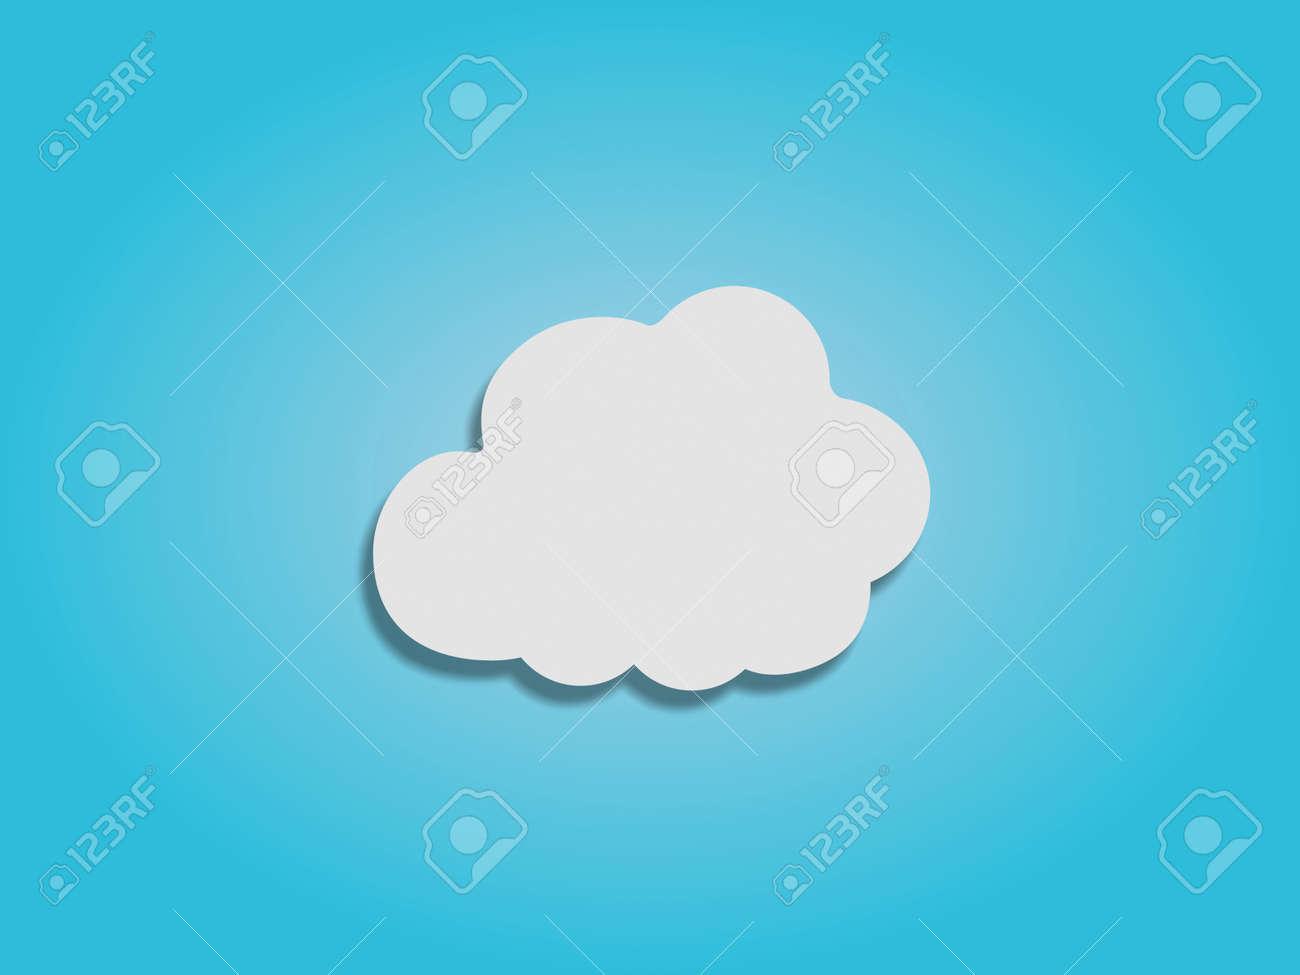 Paper white cloud symbol on blue sky background stock photo paper white cloud symbol on blue sky background stock photo 27789995 biocorpaavc Gallery